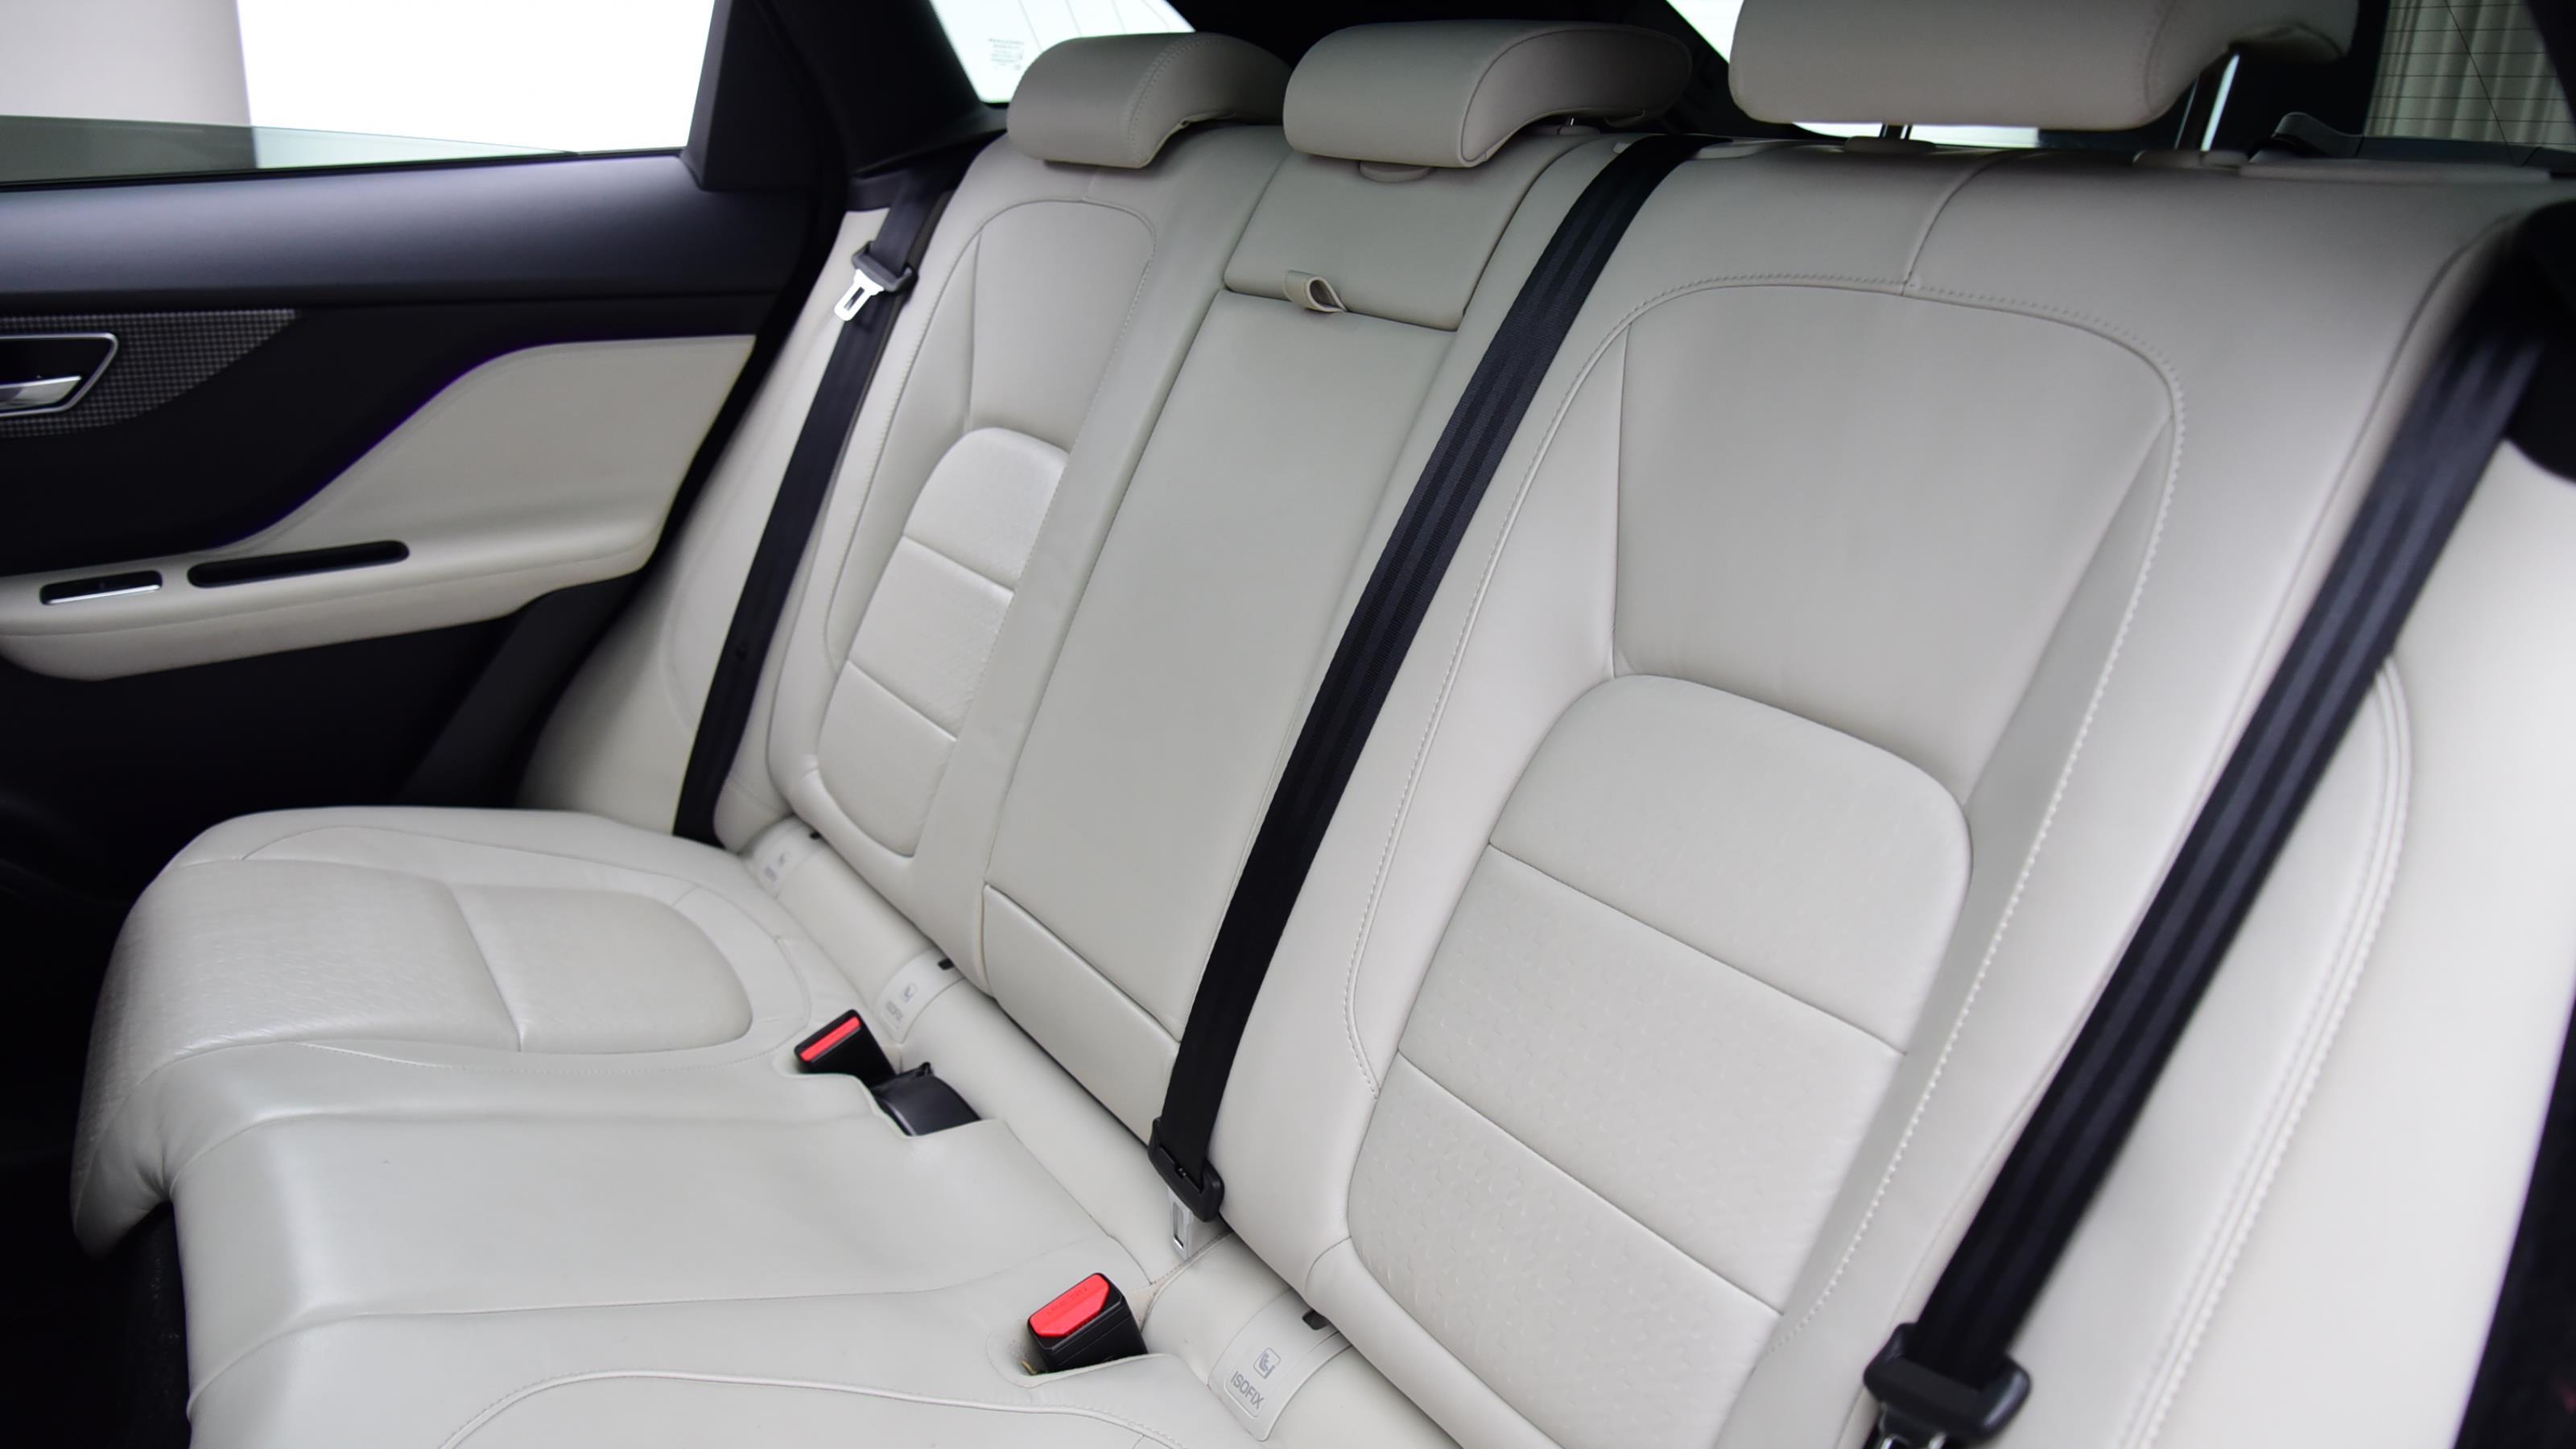 Used 2016 Jaguar F-PACE 3.0d V6 1st Edition 5dr Auto AWD Black at Saxton4x4